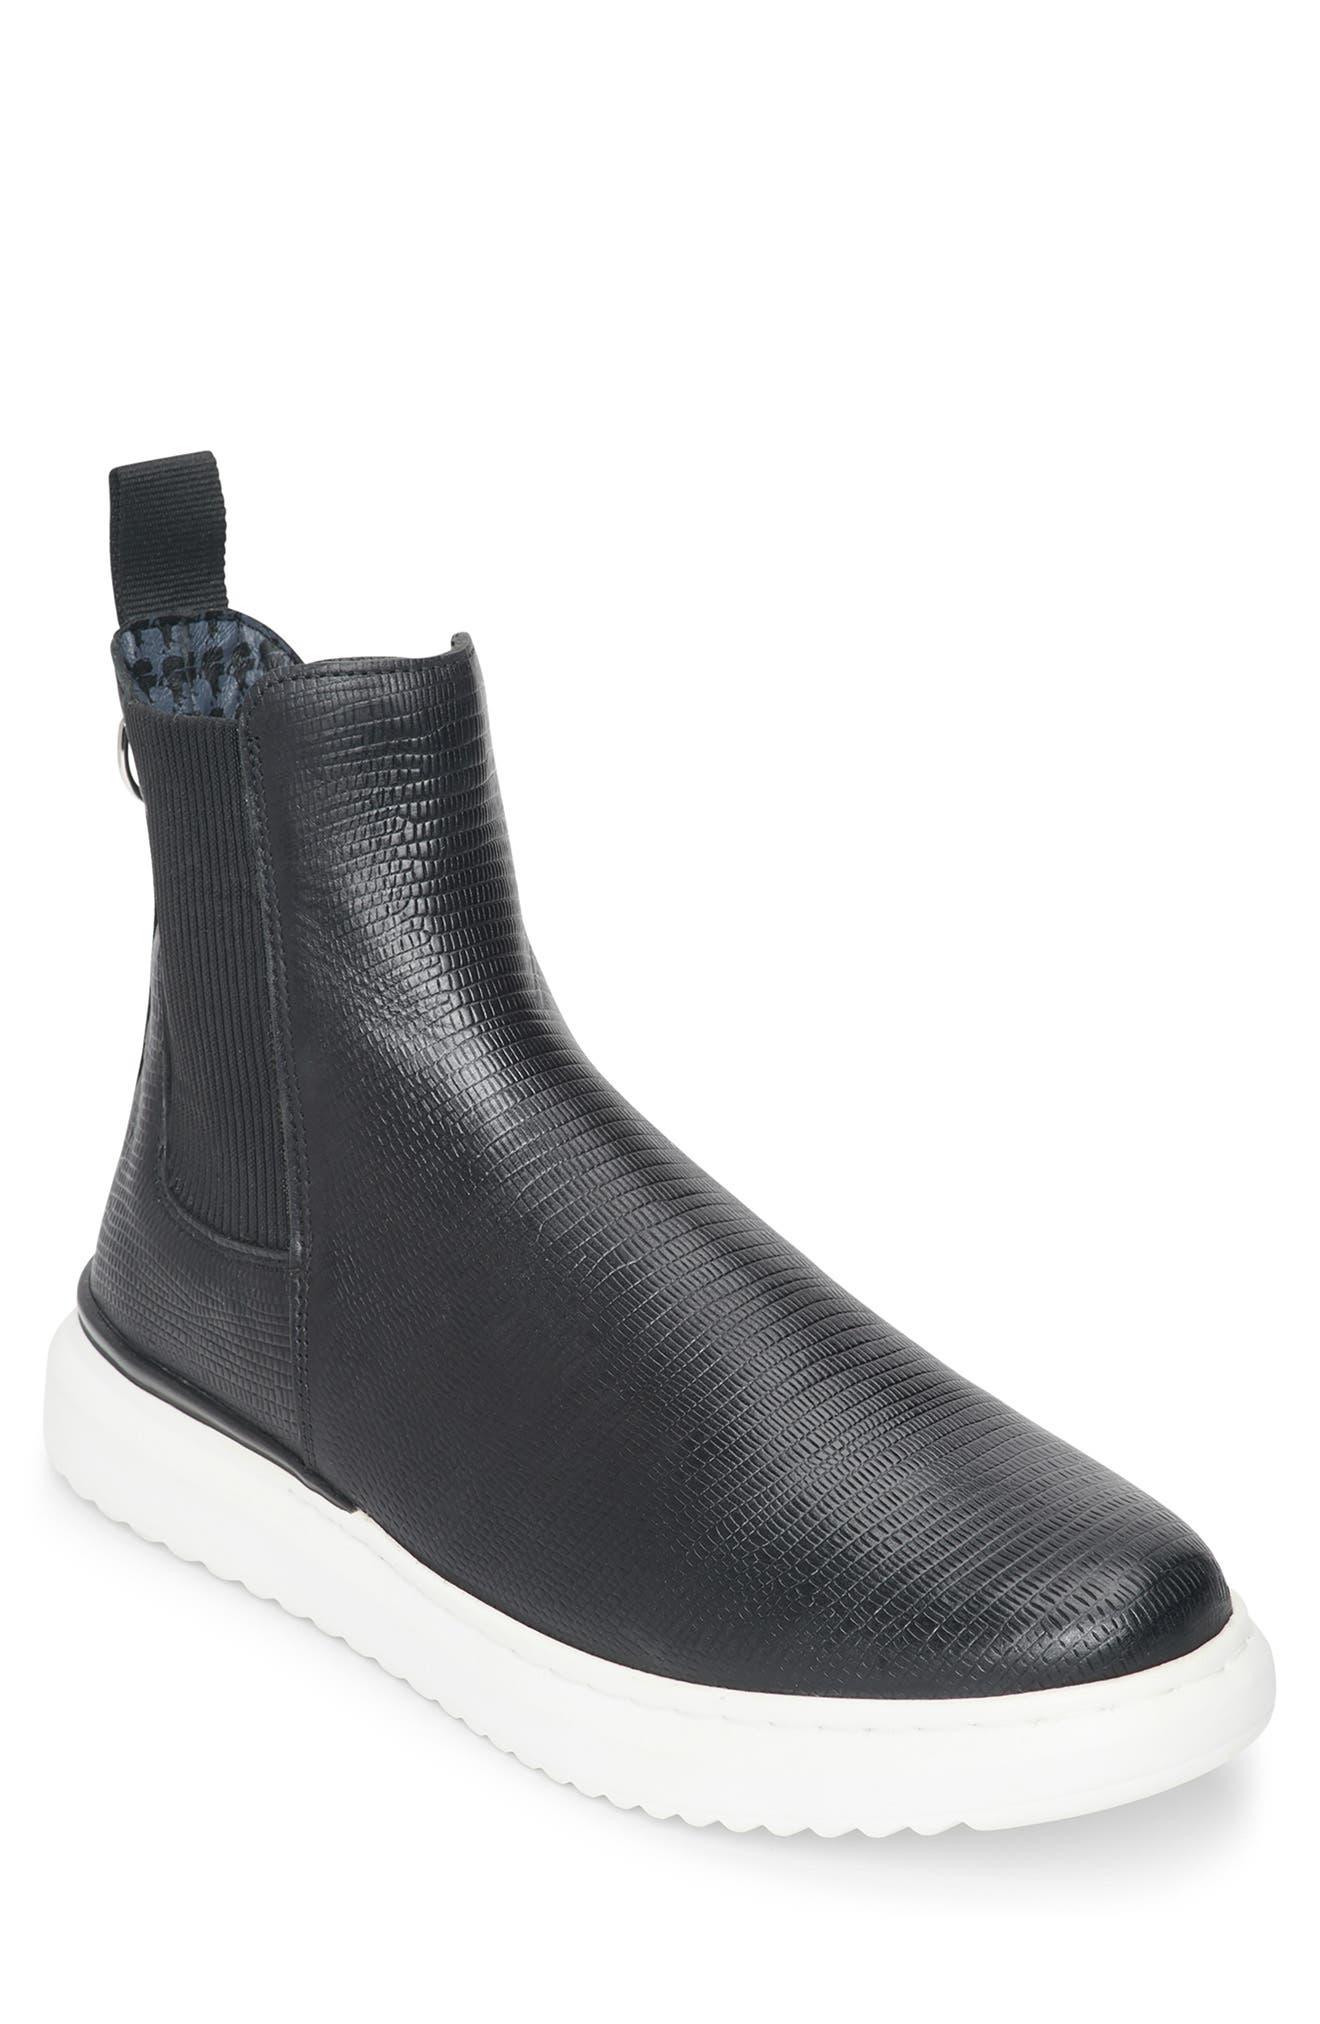 Lizard Embossed Chelsea Boot